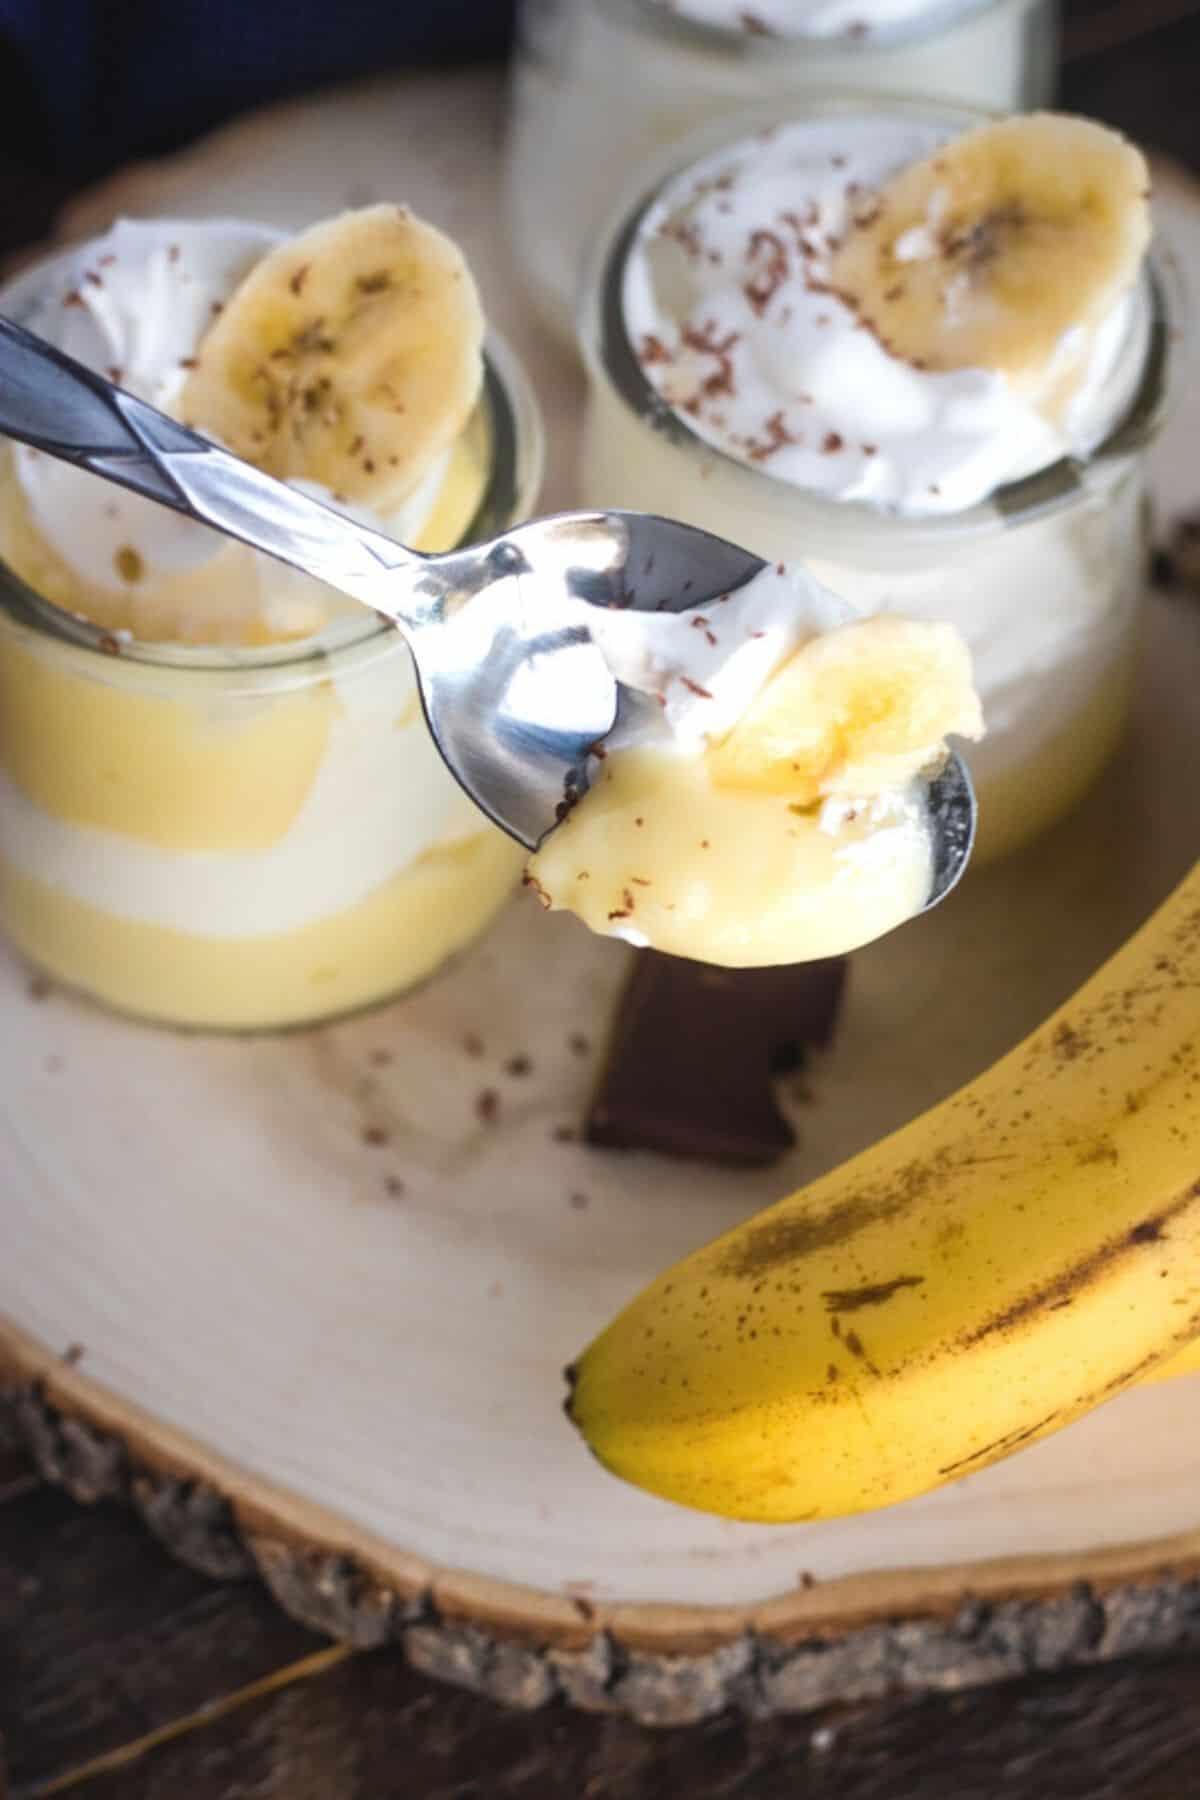 bite of banana cream parfait on a spoon